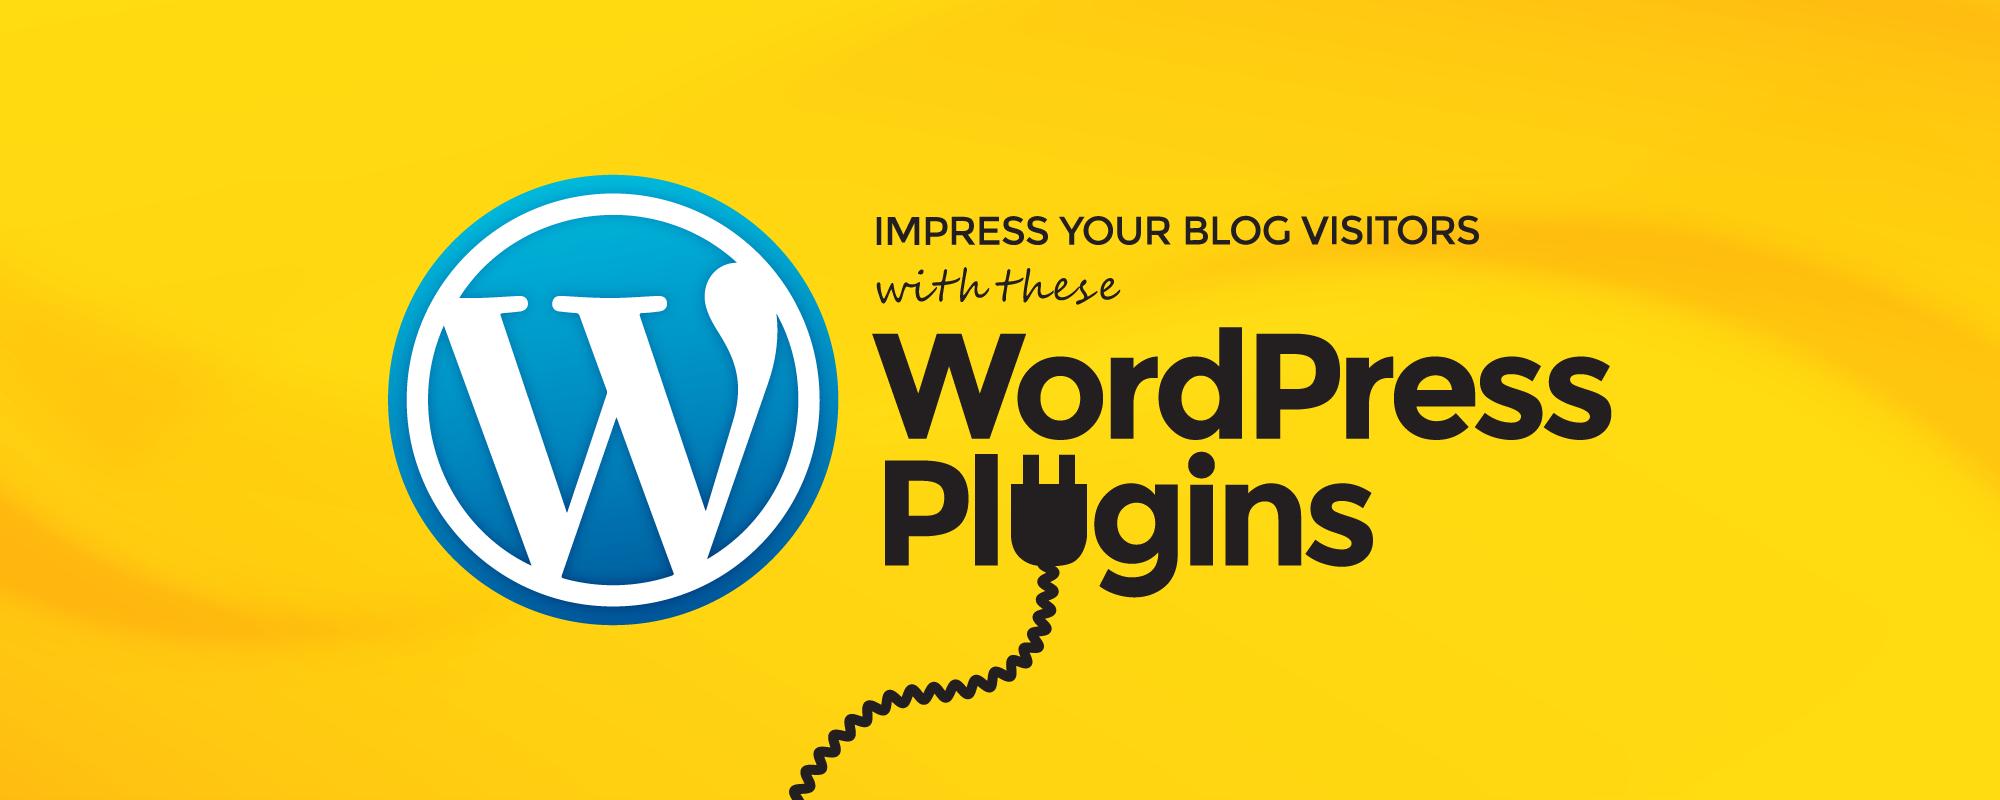 10 WordPress Plugins You Need to Impress your Blog Visitors